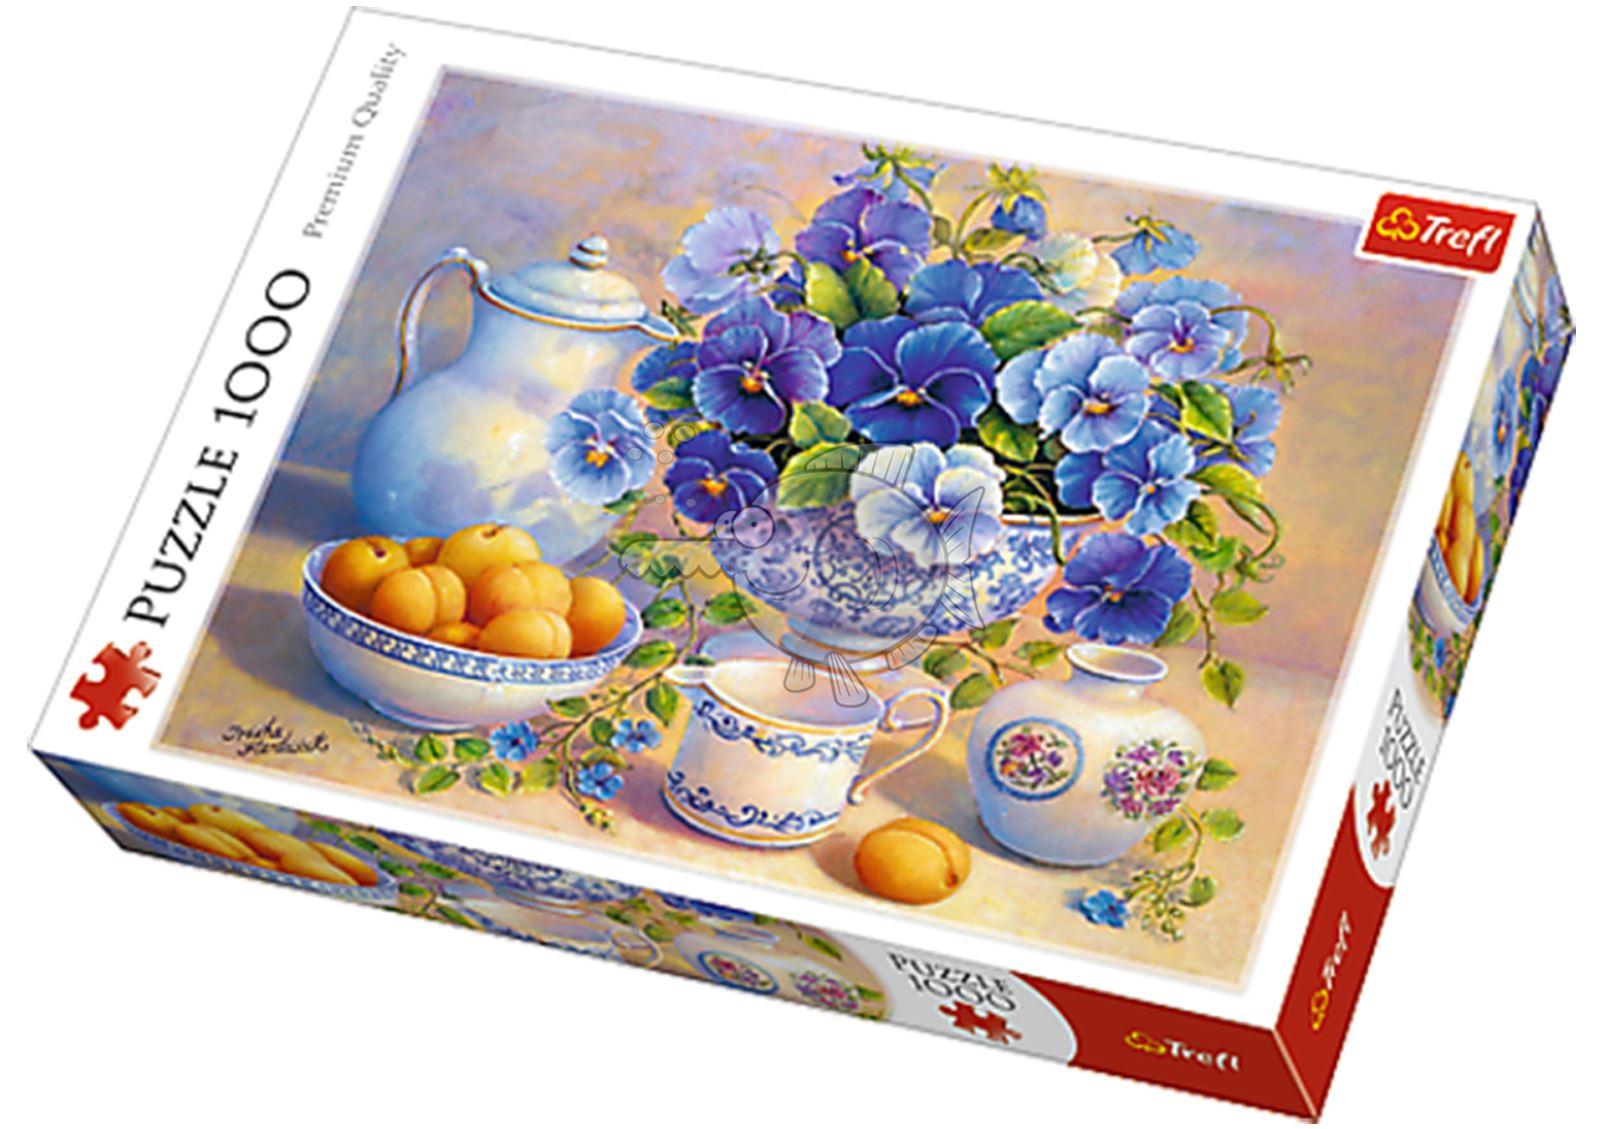 Trefl-300-500-1000-1500-2000-3000-4000-6000-Piece-Jigsaw-Puzzle-Landscapes-City thumbnail 49